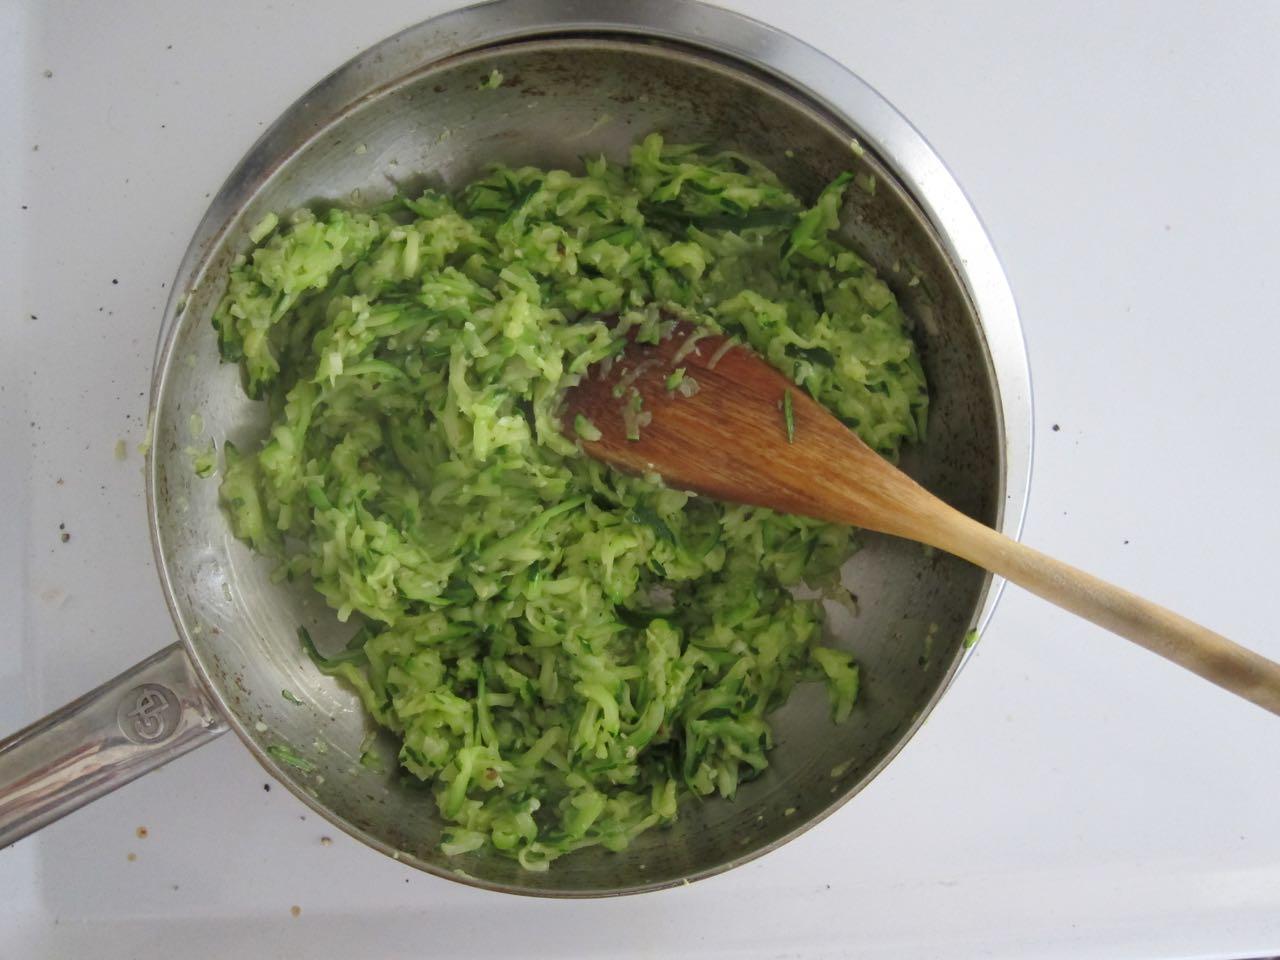 cooking shredded zucchini